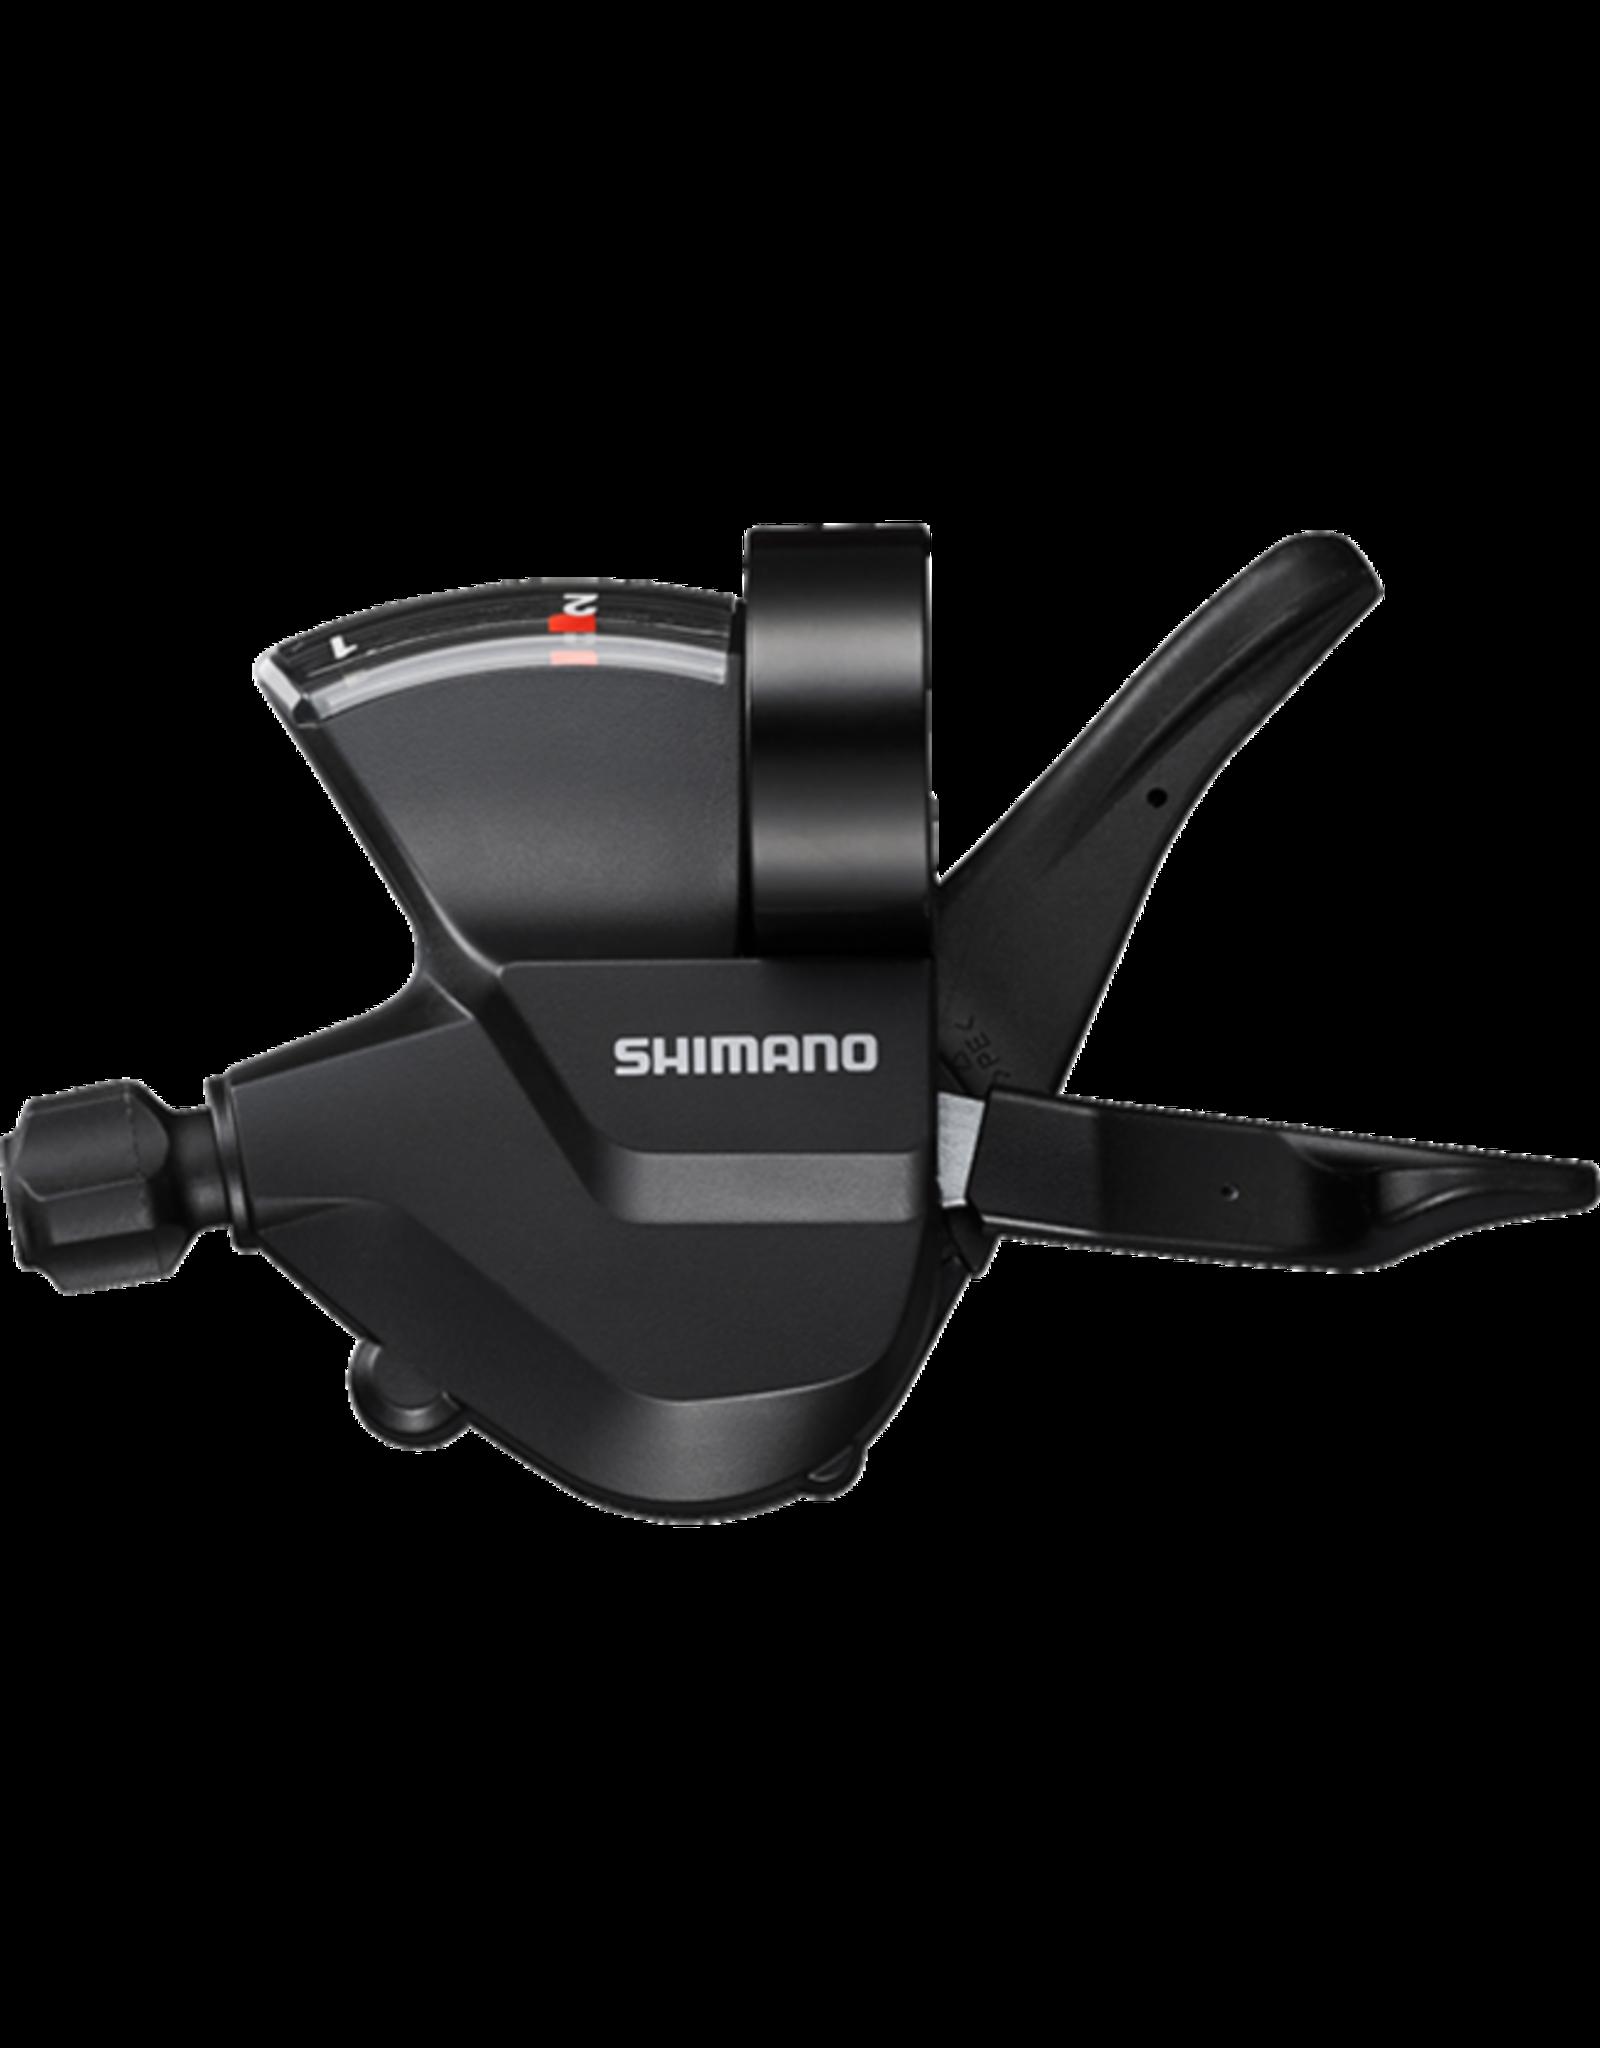 SHIMANO Shimano Shift Lever SL-M315-2L, Left 2-Speed Rapidfire Plus 1